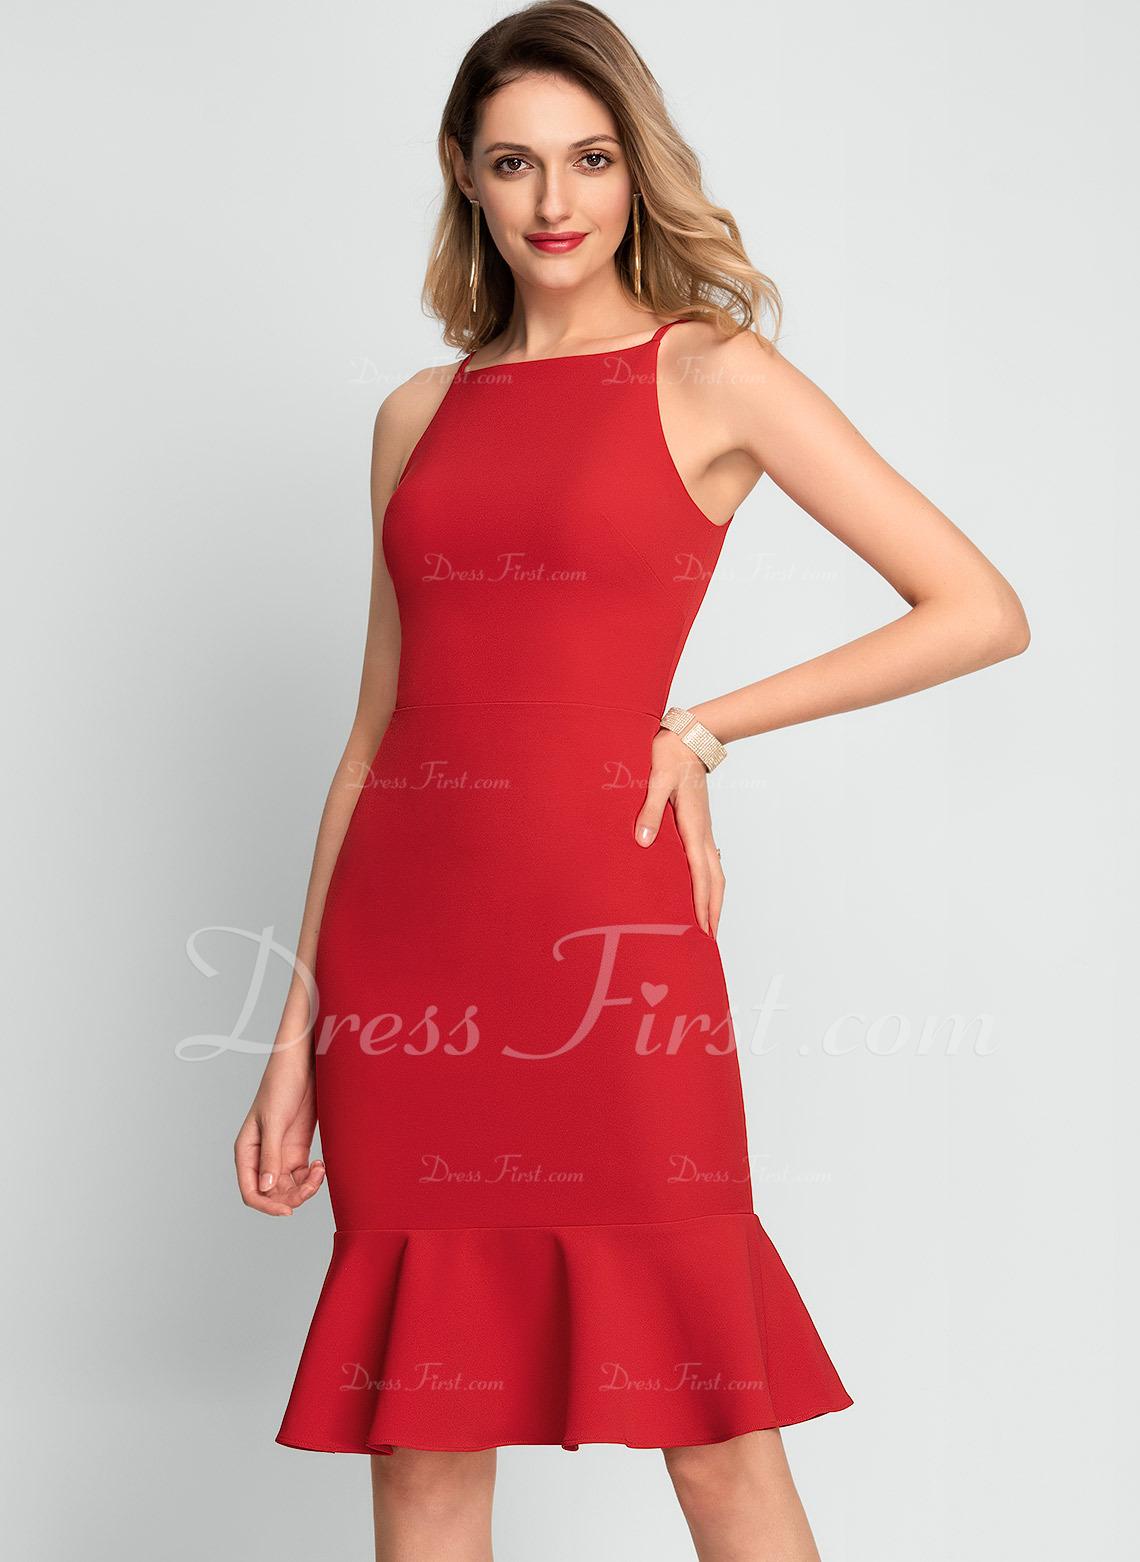 Trumpet/Mermaid Square Neckline Knee-Length Stretch Crepe Cocktail Dress